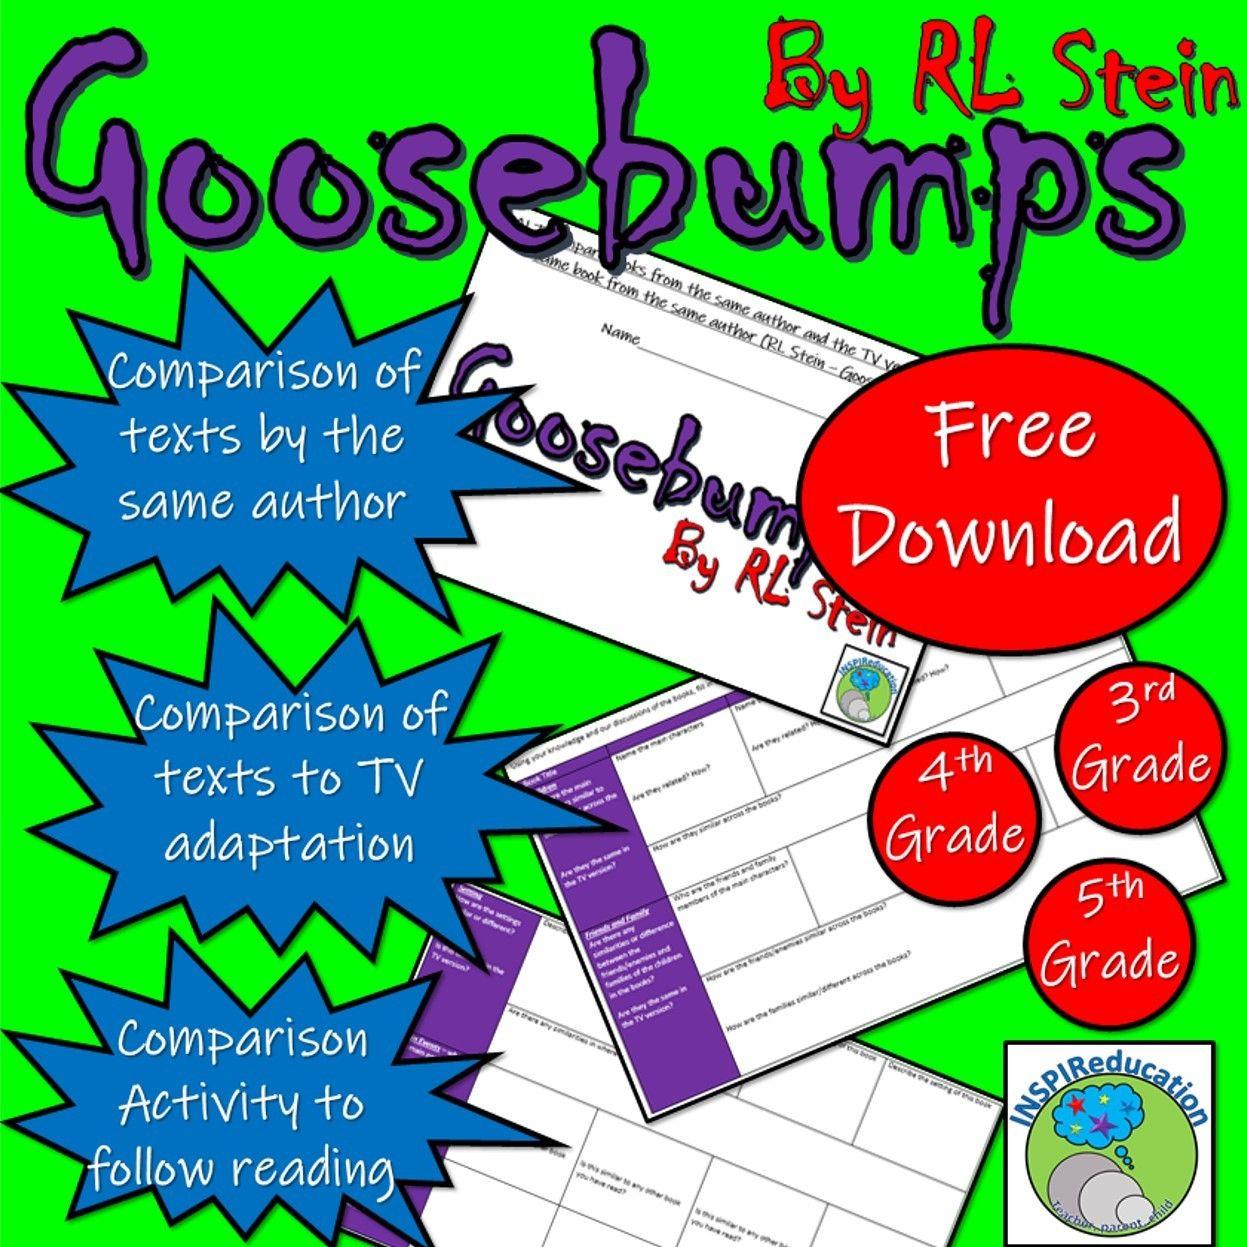 Goosebumps By Rl Stein Novel Comparison Worksheet